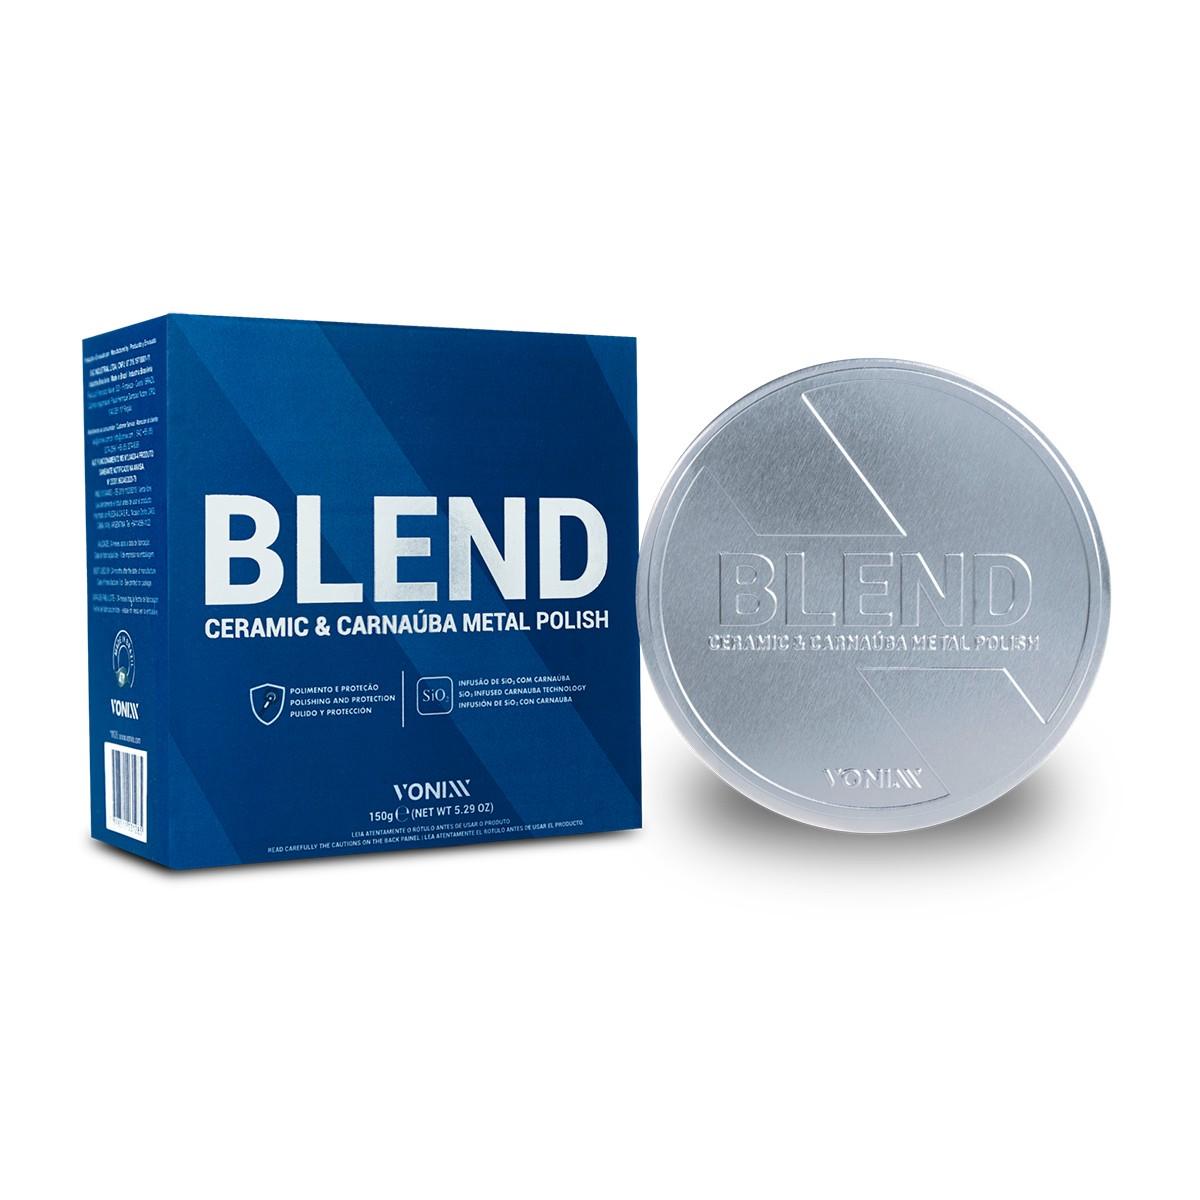 Blend Ceramic & Carnaúba Metal Polish - Vonixx